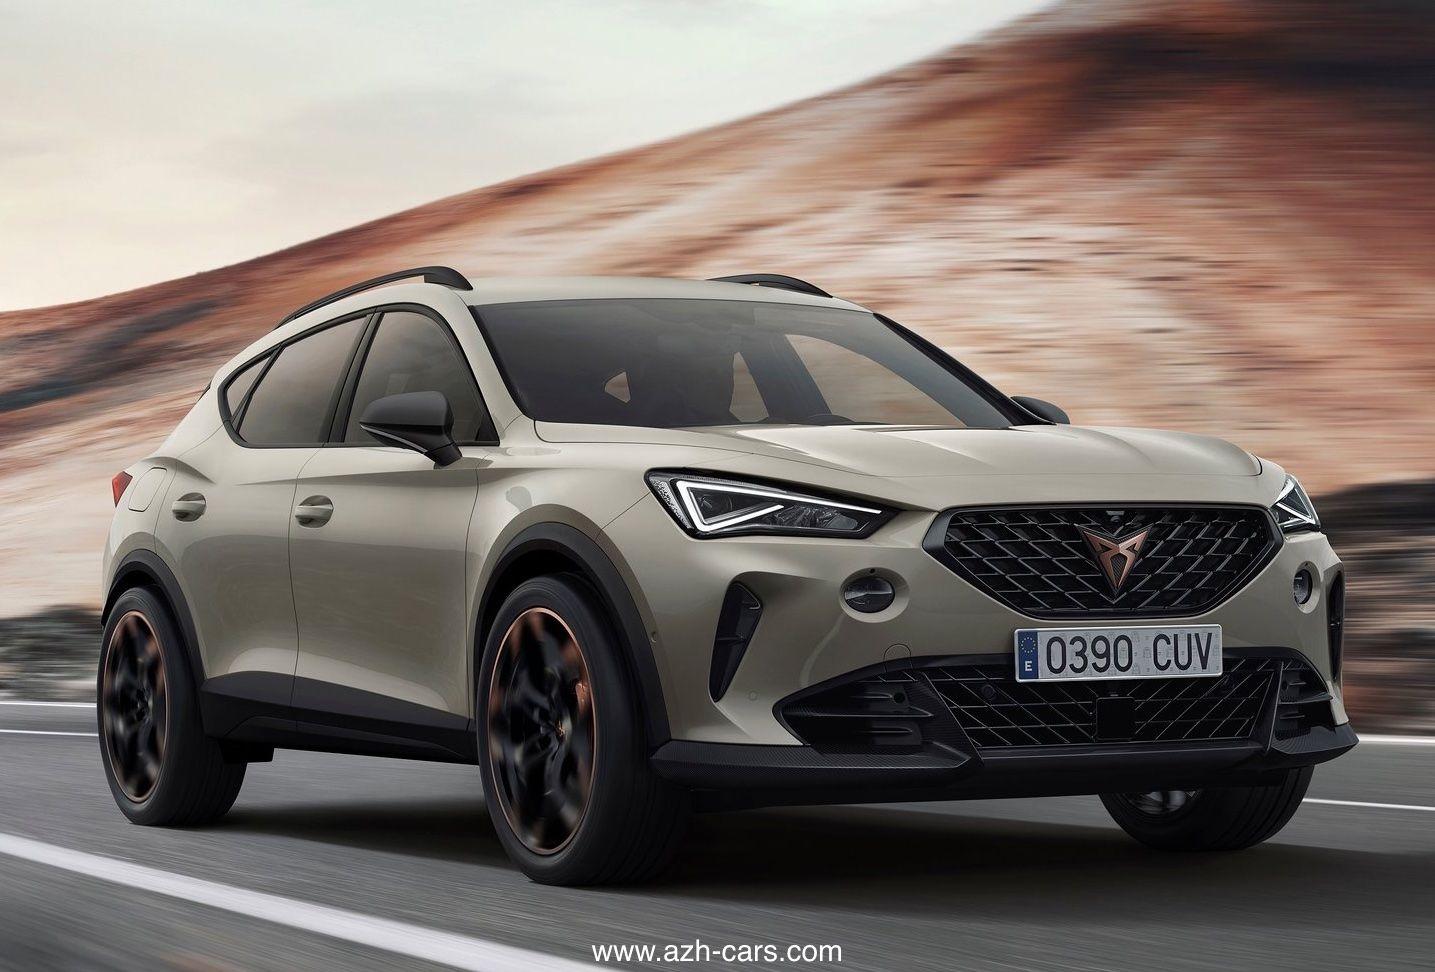 2022 Cupra Formentor Vz5 In 2021 My Dream Car Car Dream Cars